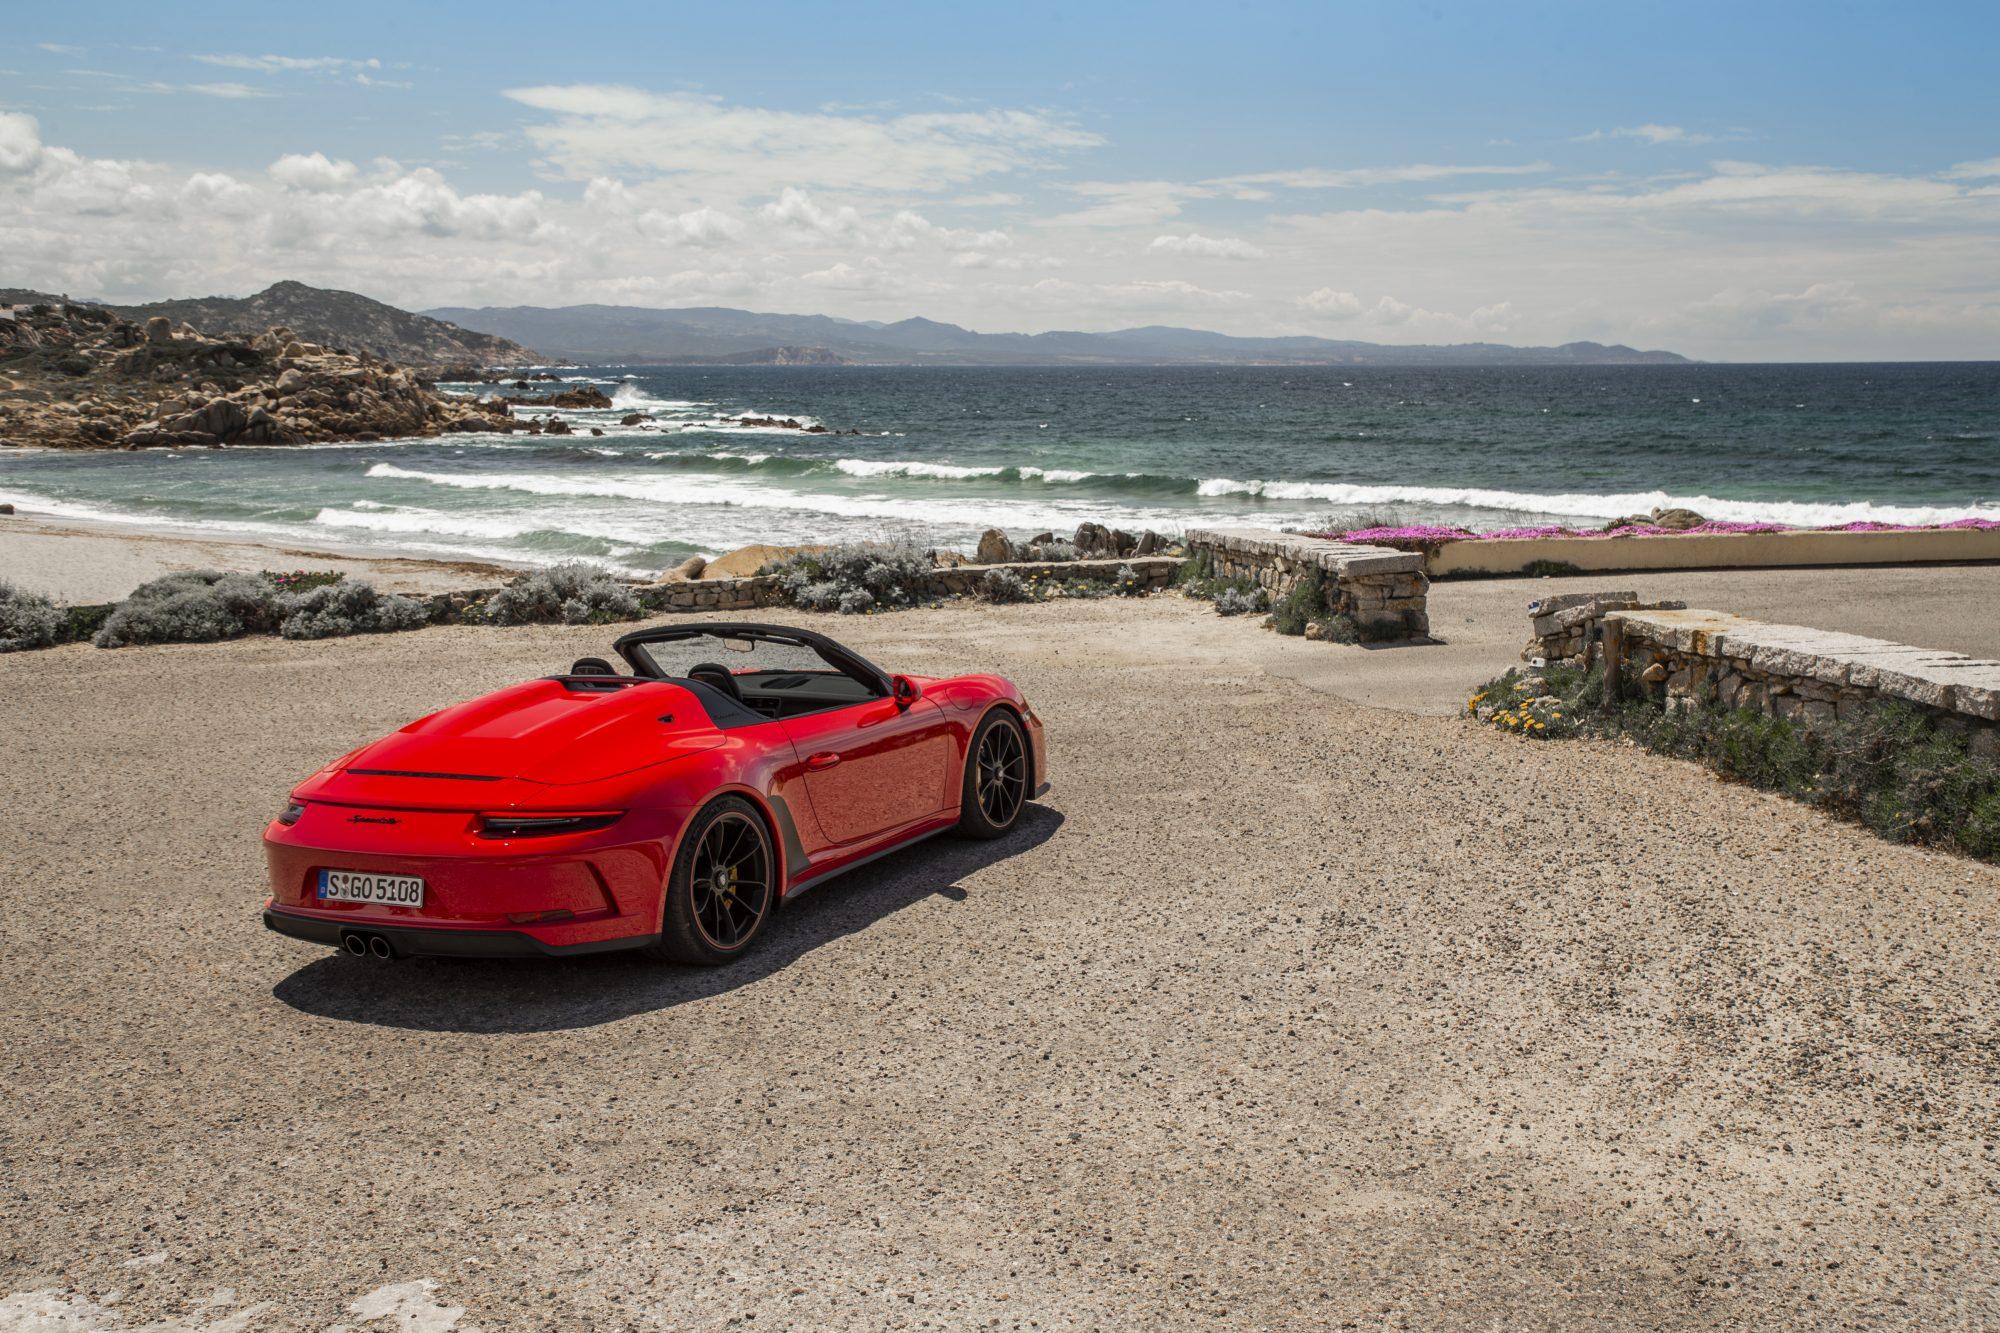 Porsche 911 Speedster, luxury, luxury car, sport car, Porsche, Sardinia, Italy, speed, GT3, road, trip, holiday, Carrera 4 Cabriolet, ceramic brakes, cabrio, manually-operated roof,